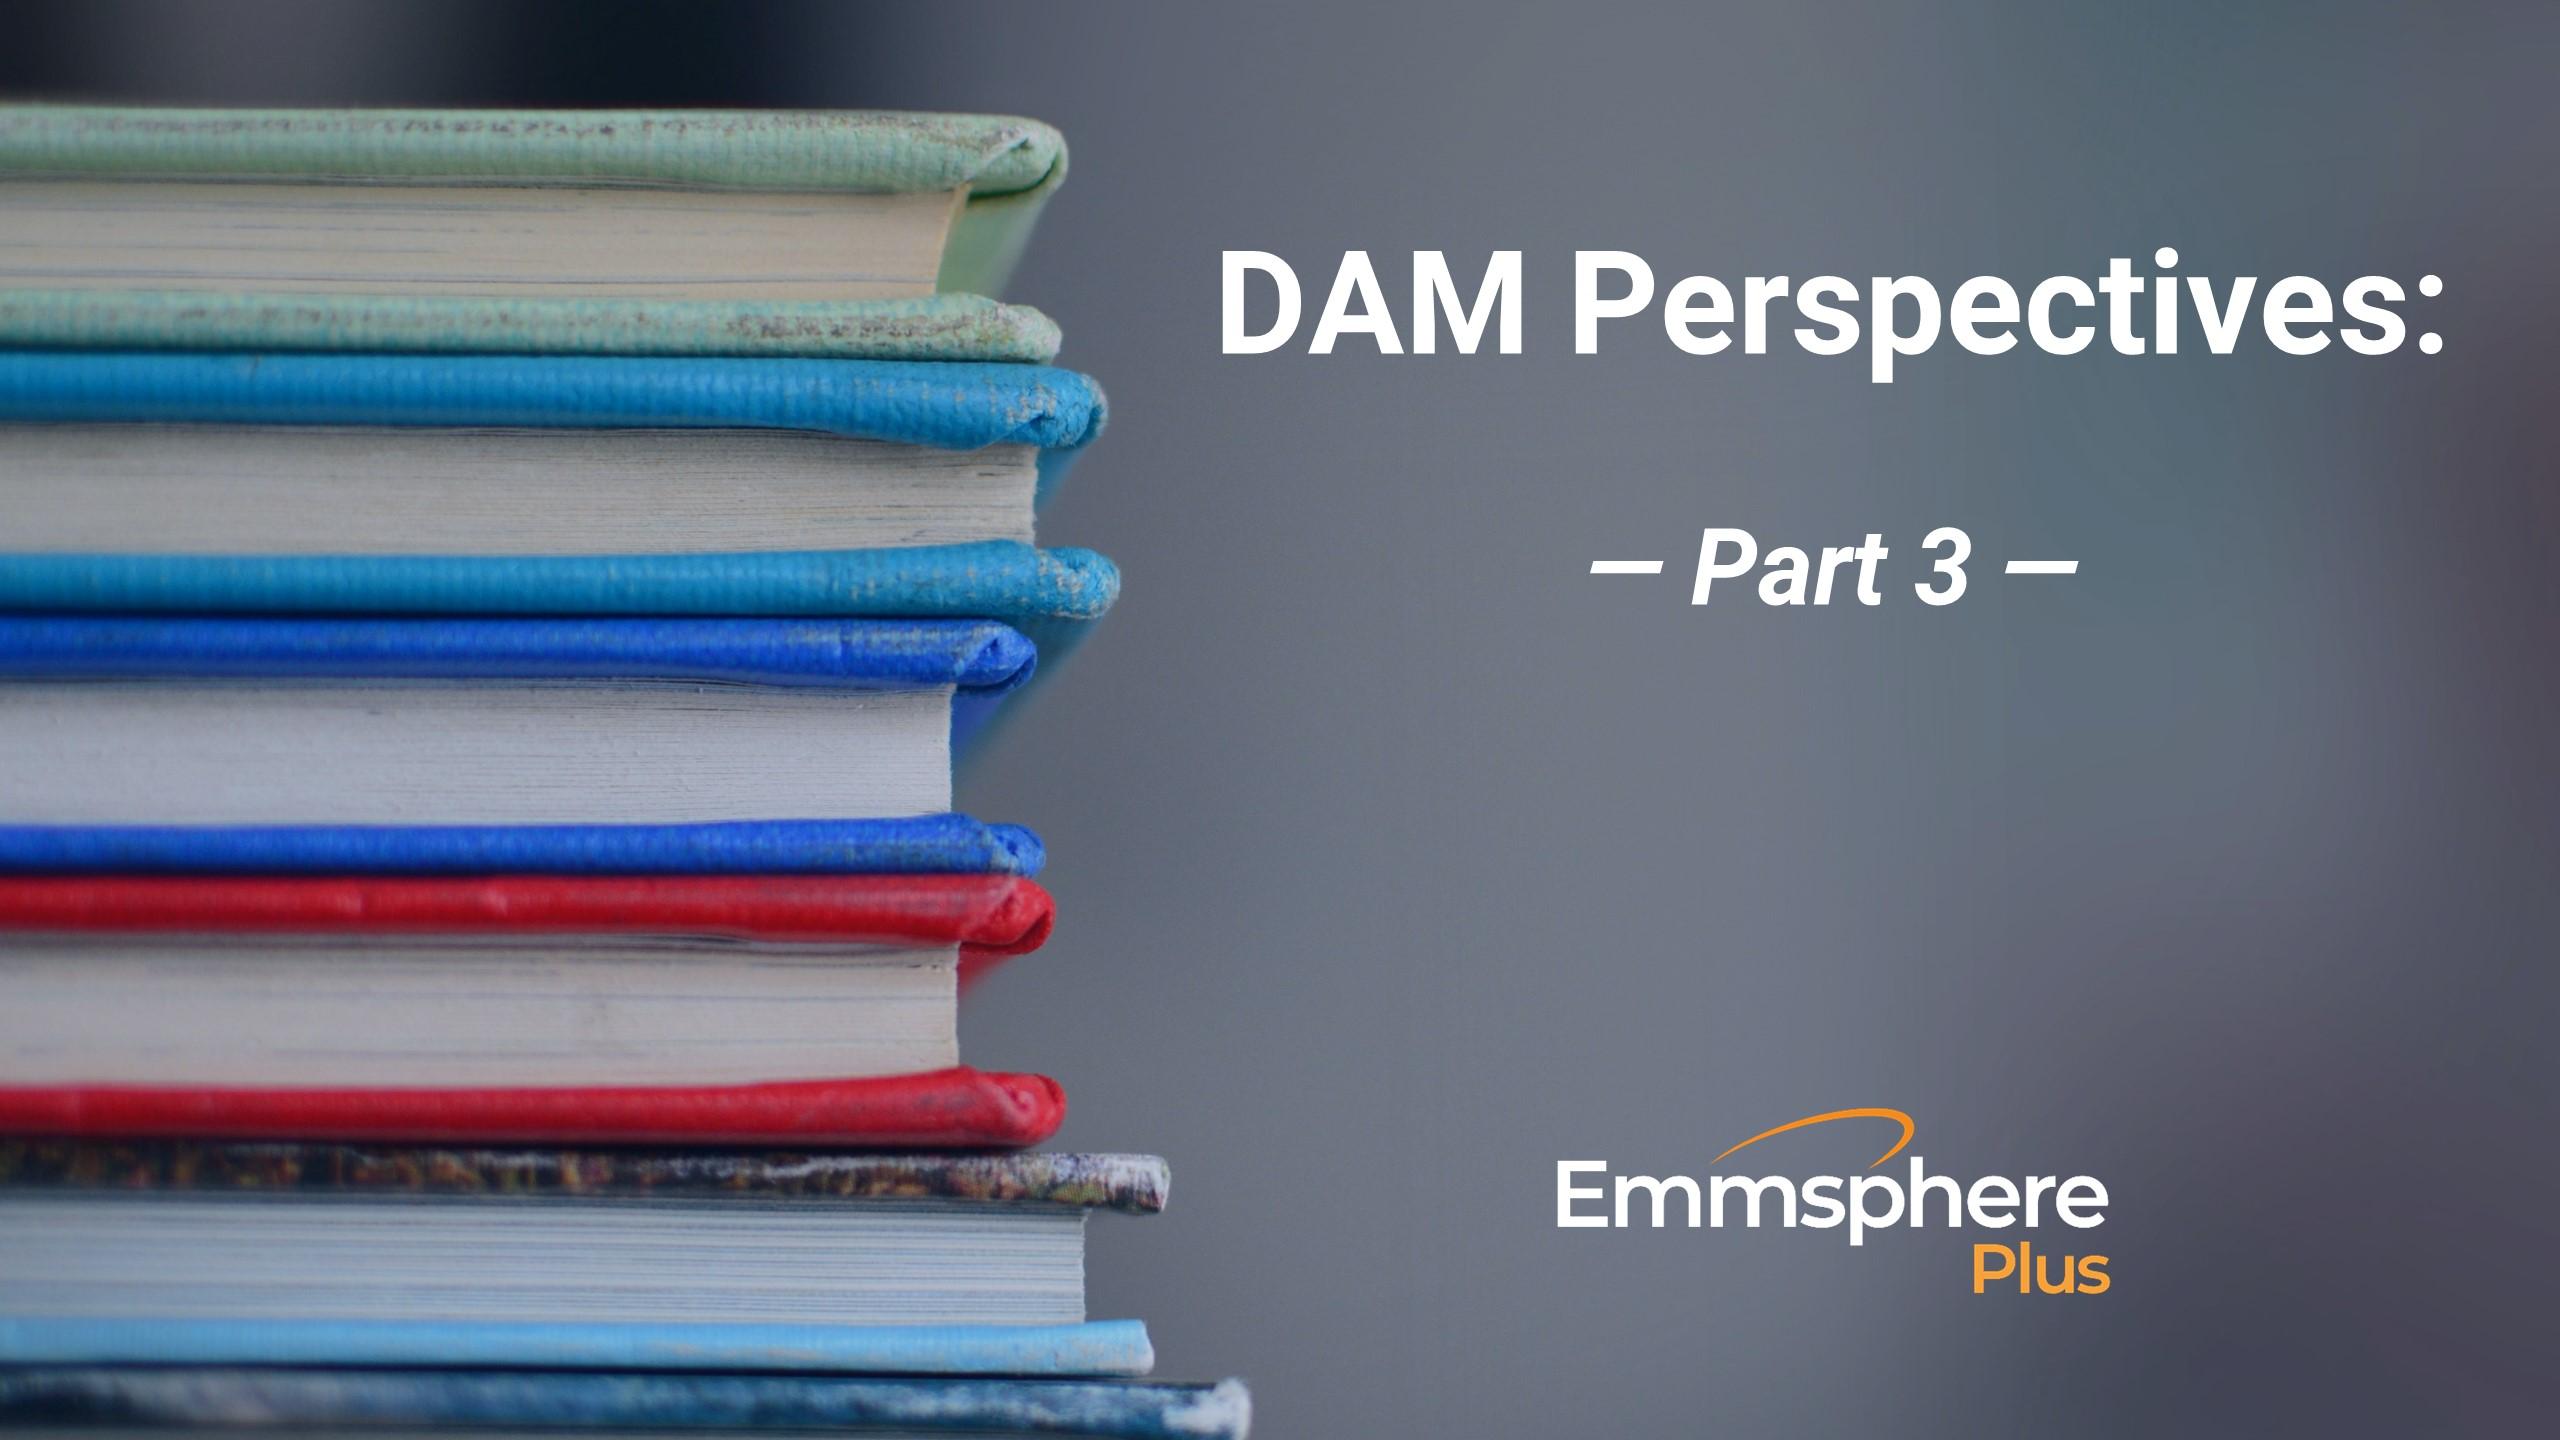 DAM Perspectives – Part 3